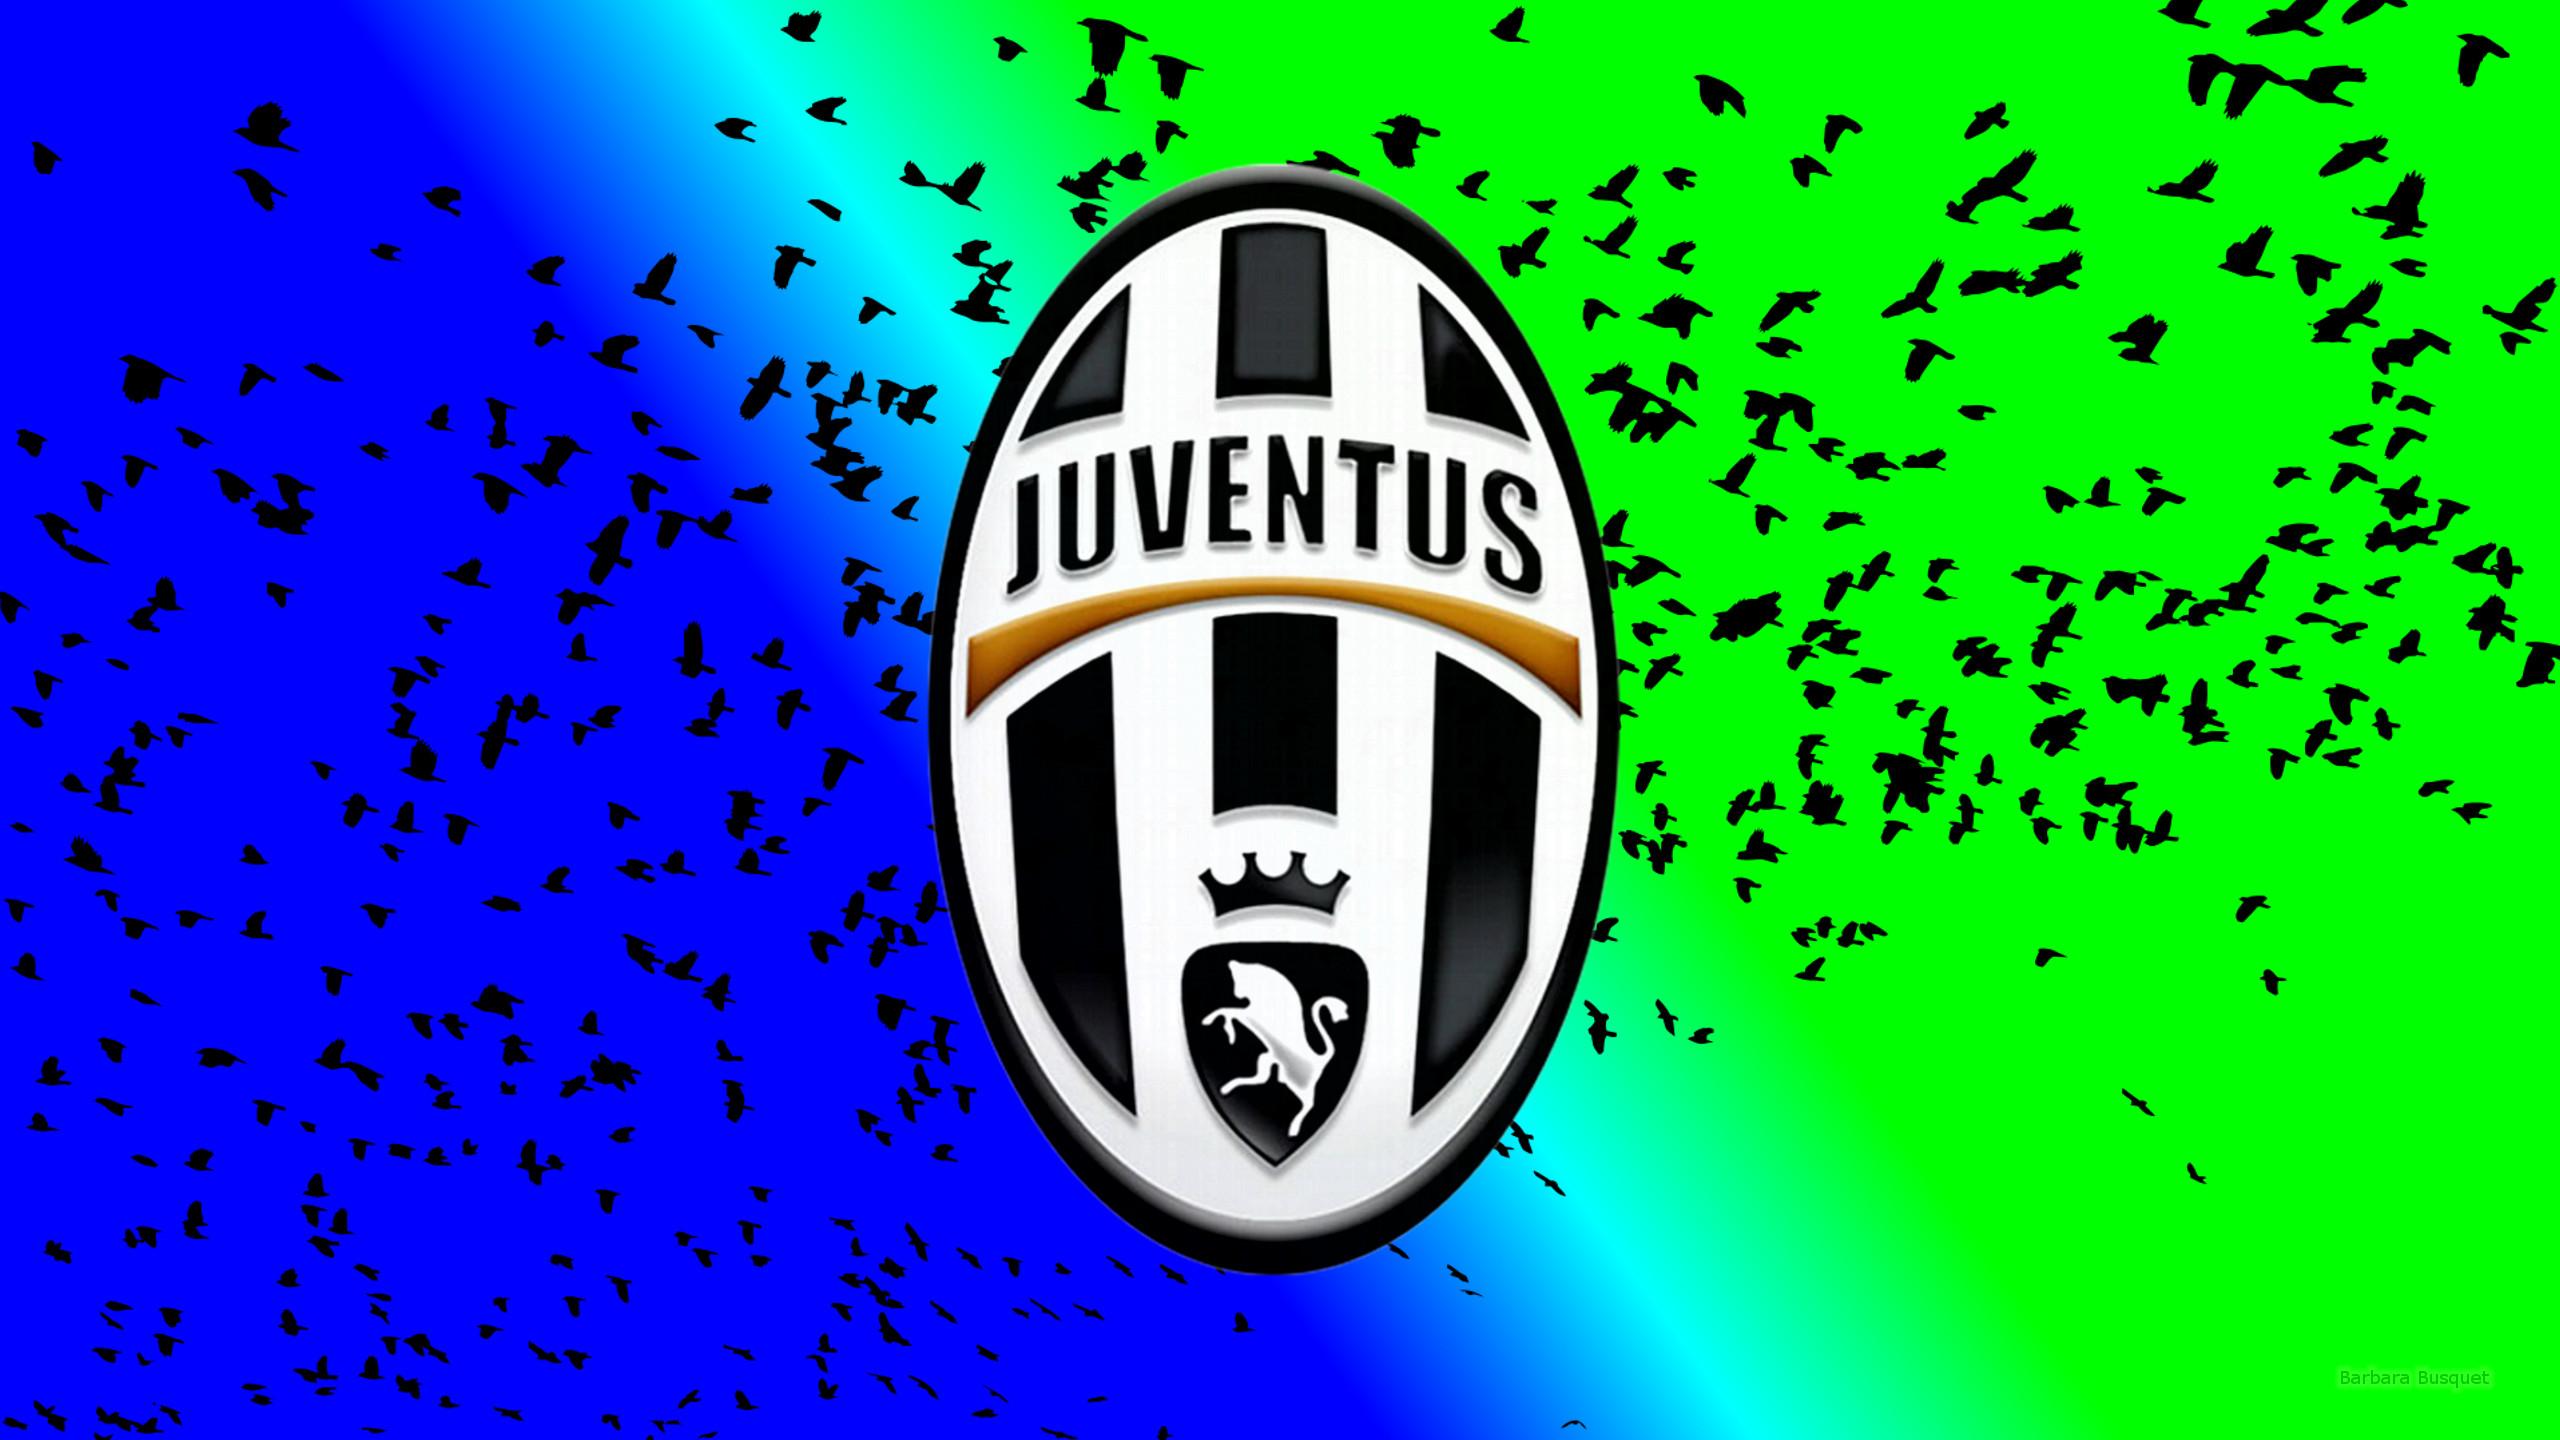 Juventus F.C. logo Wallpapers - Barbaras HD Wallpapers Dark Blue Roses Background